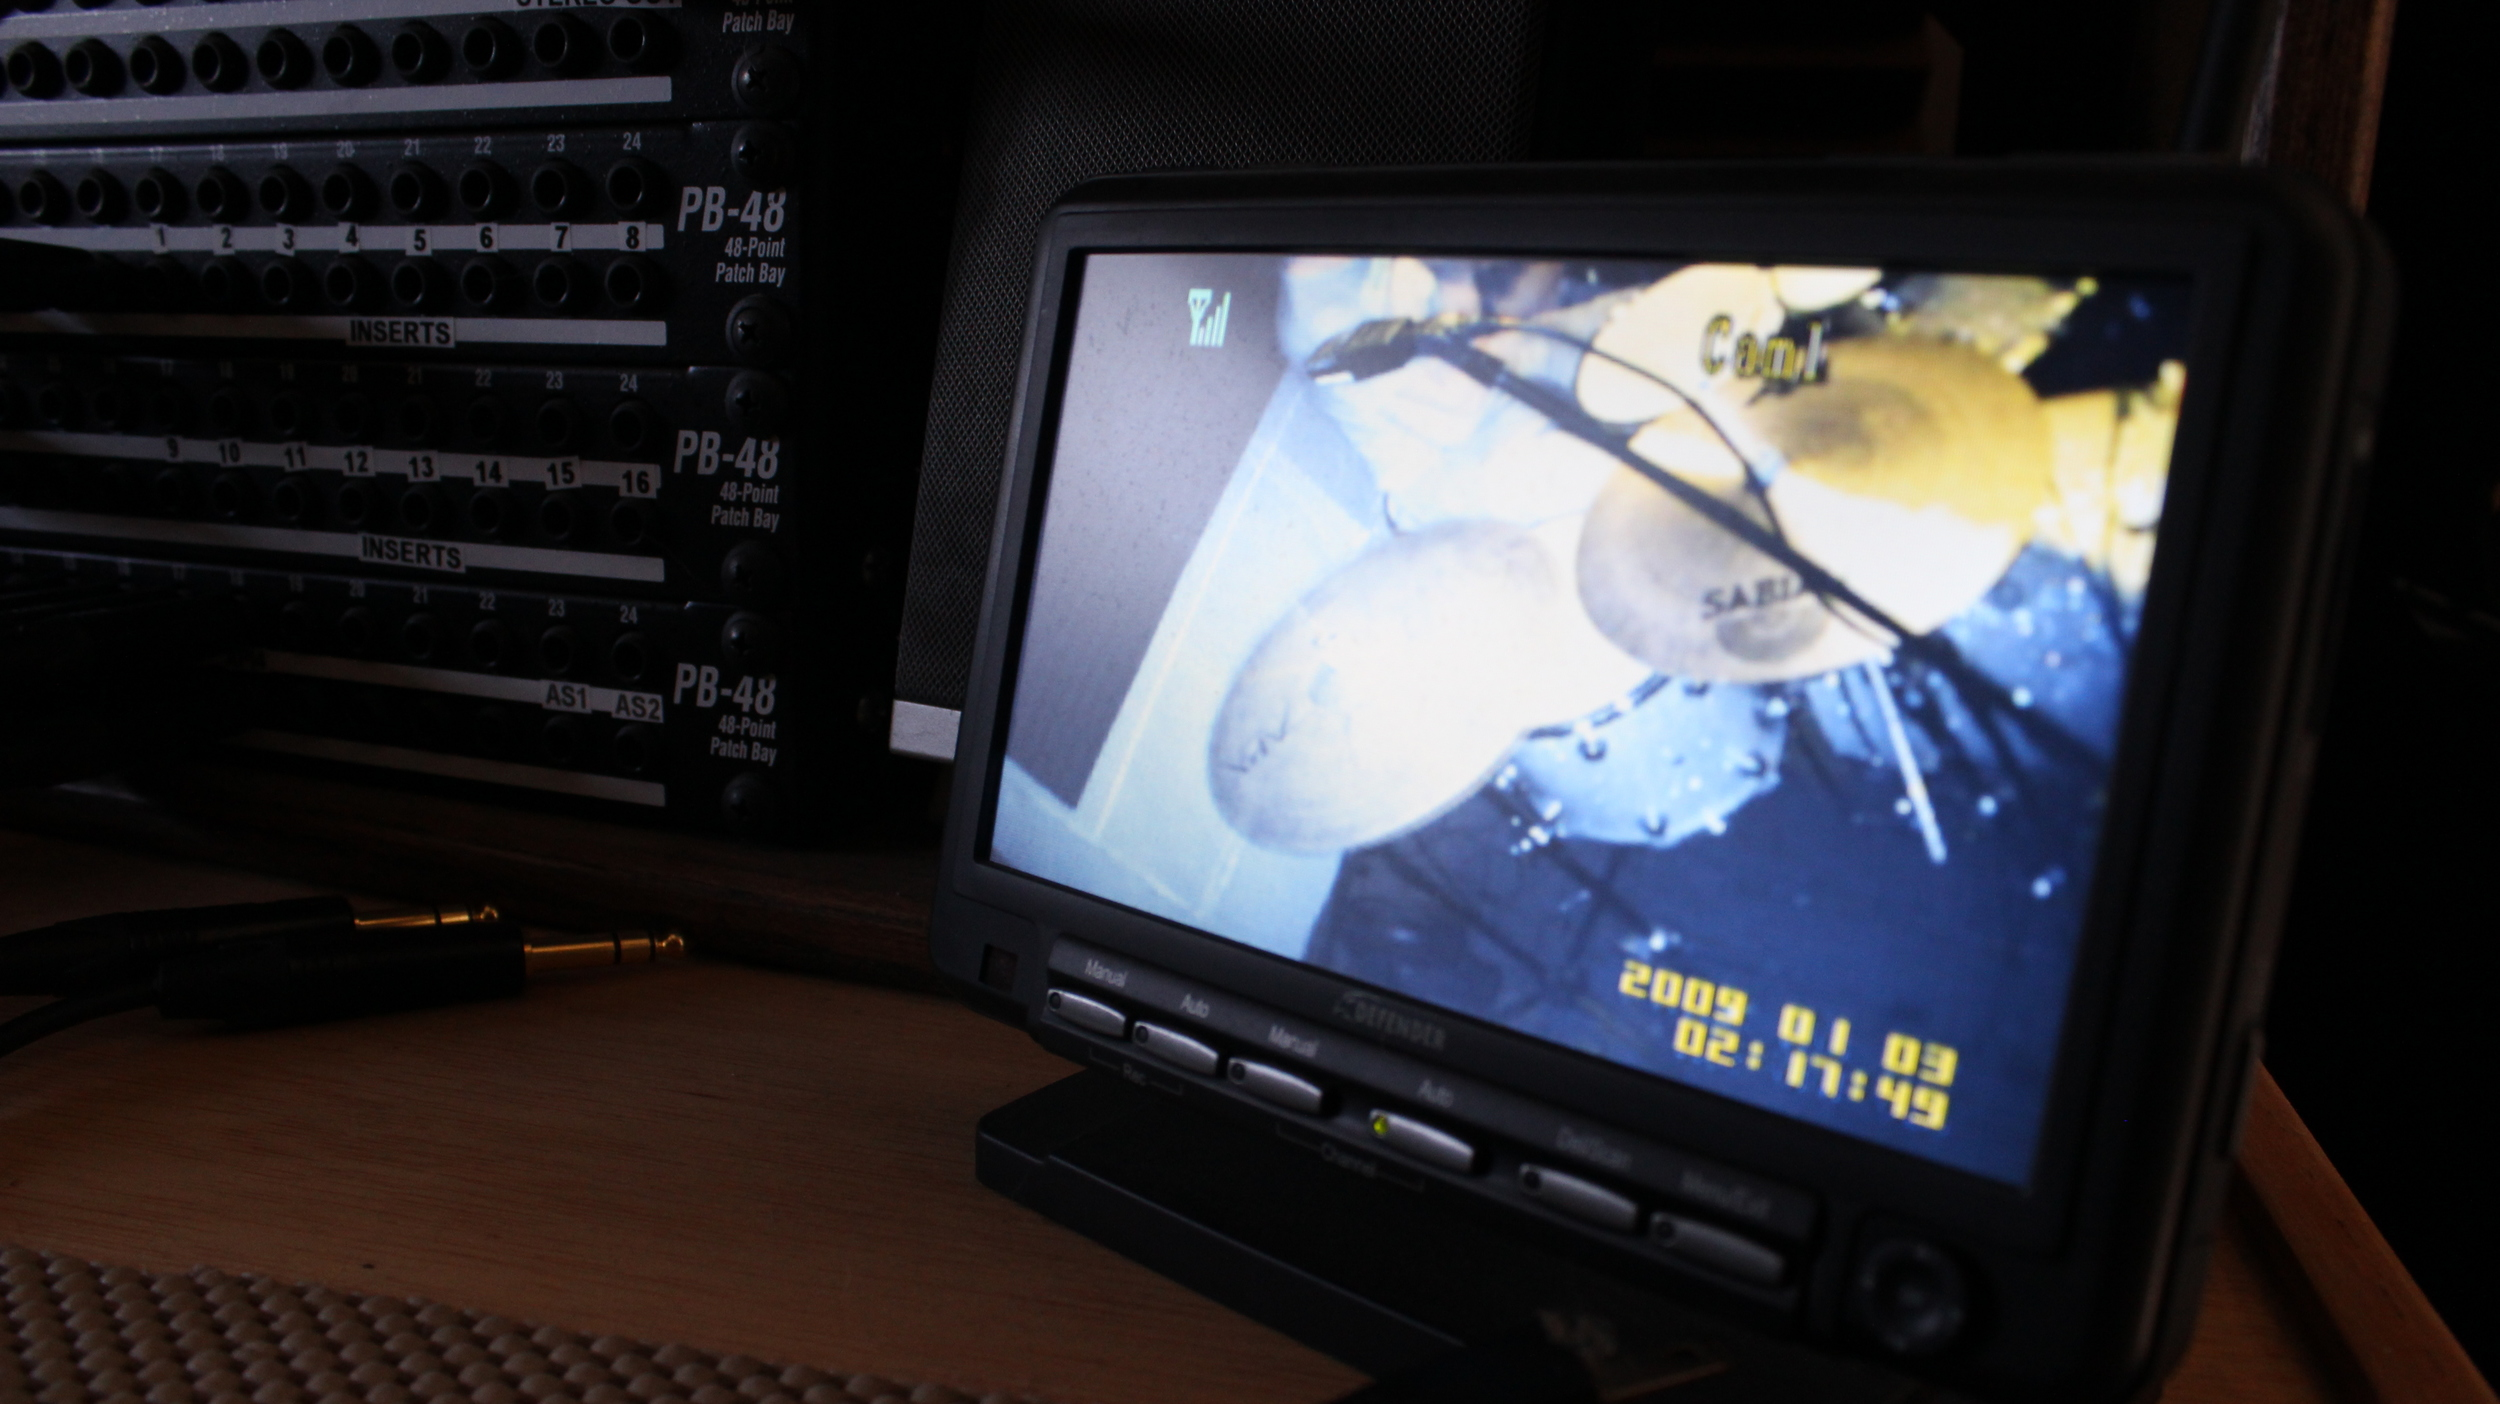 Drum room on monitor